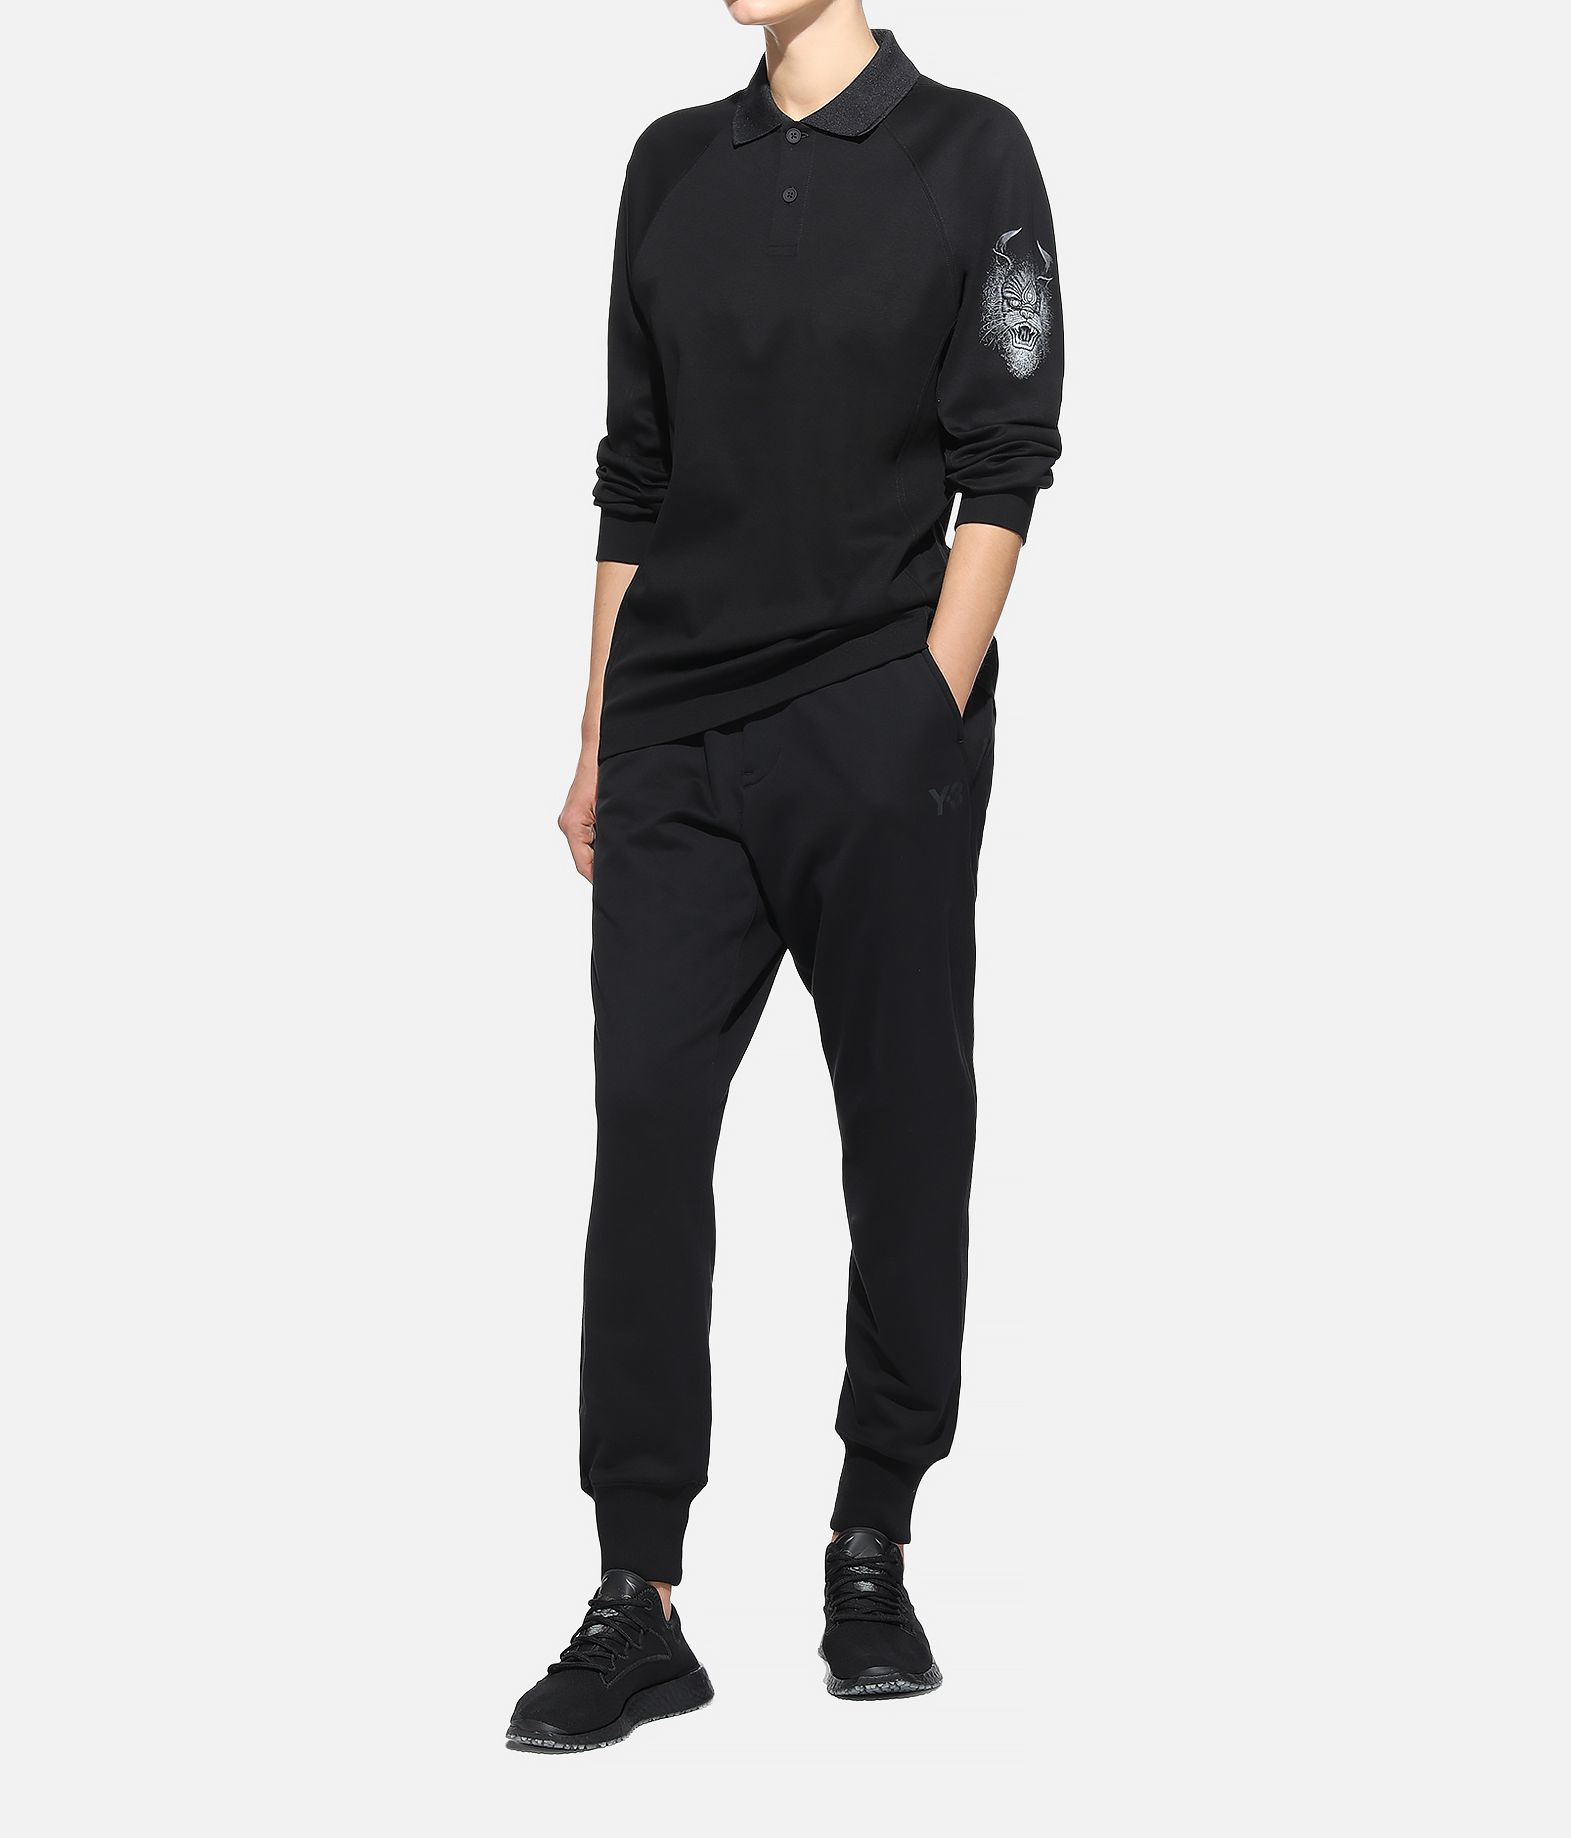 Y-3 Y-3 Long Sleeve Polo Shirt  Polohemd Dame a